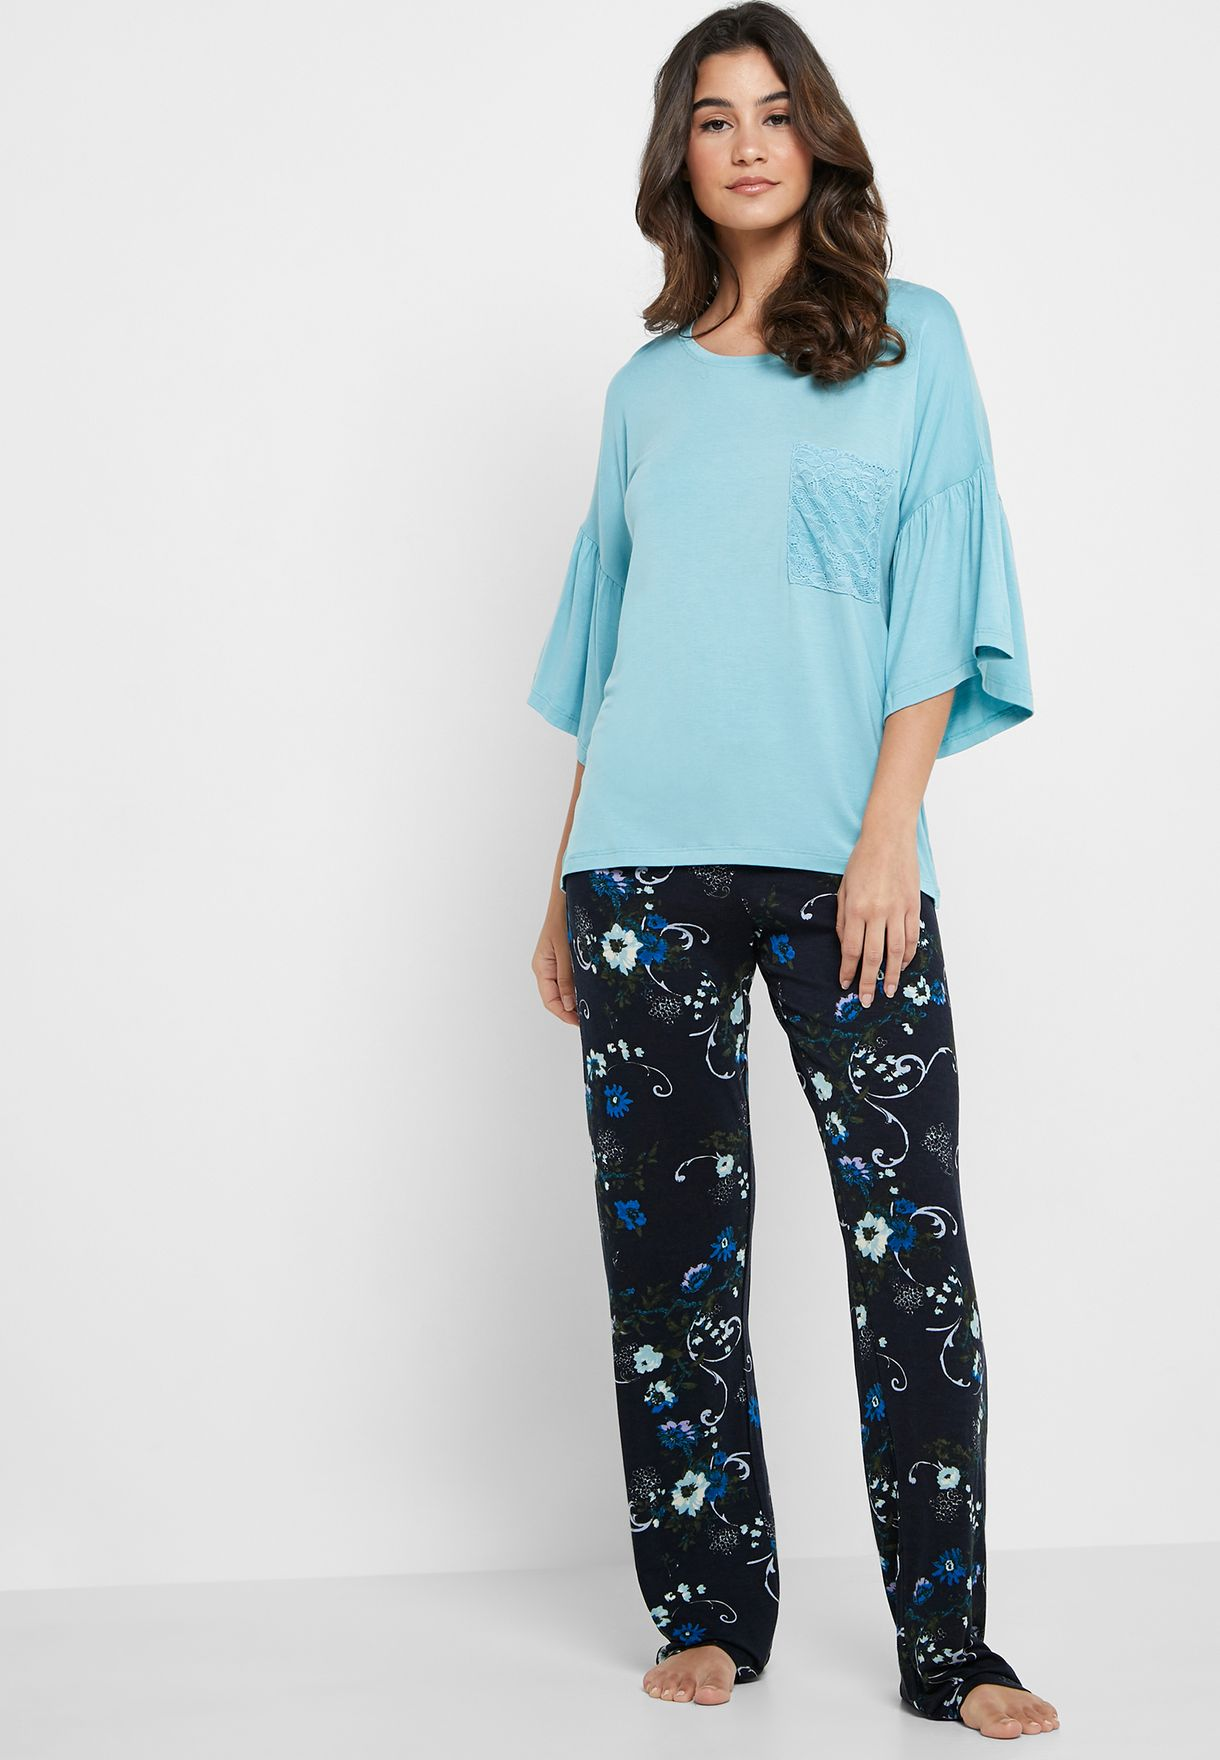 4b6fcd7a64 Shop Catherine multicolor T-Shirt & Printed Pants Pyjama Set ...